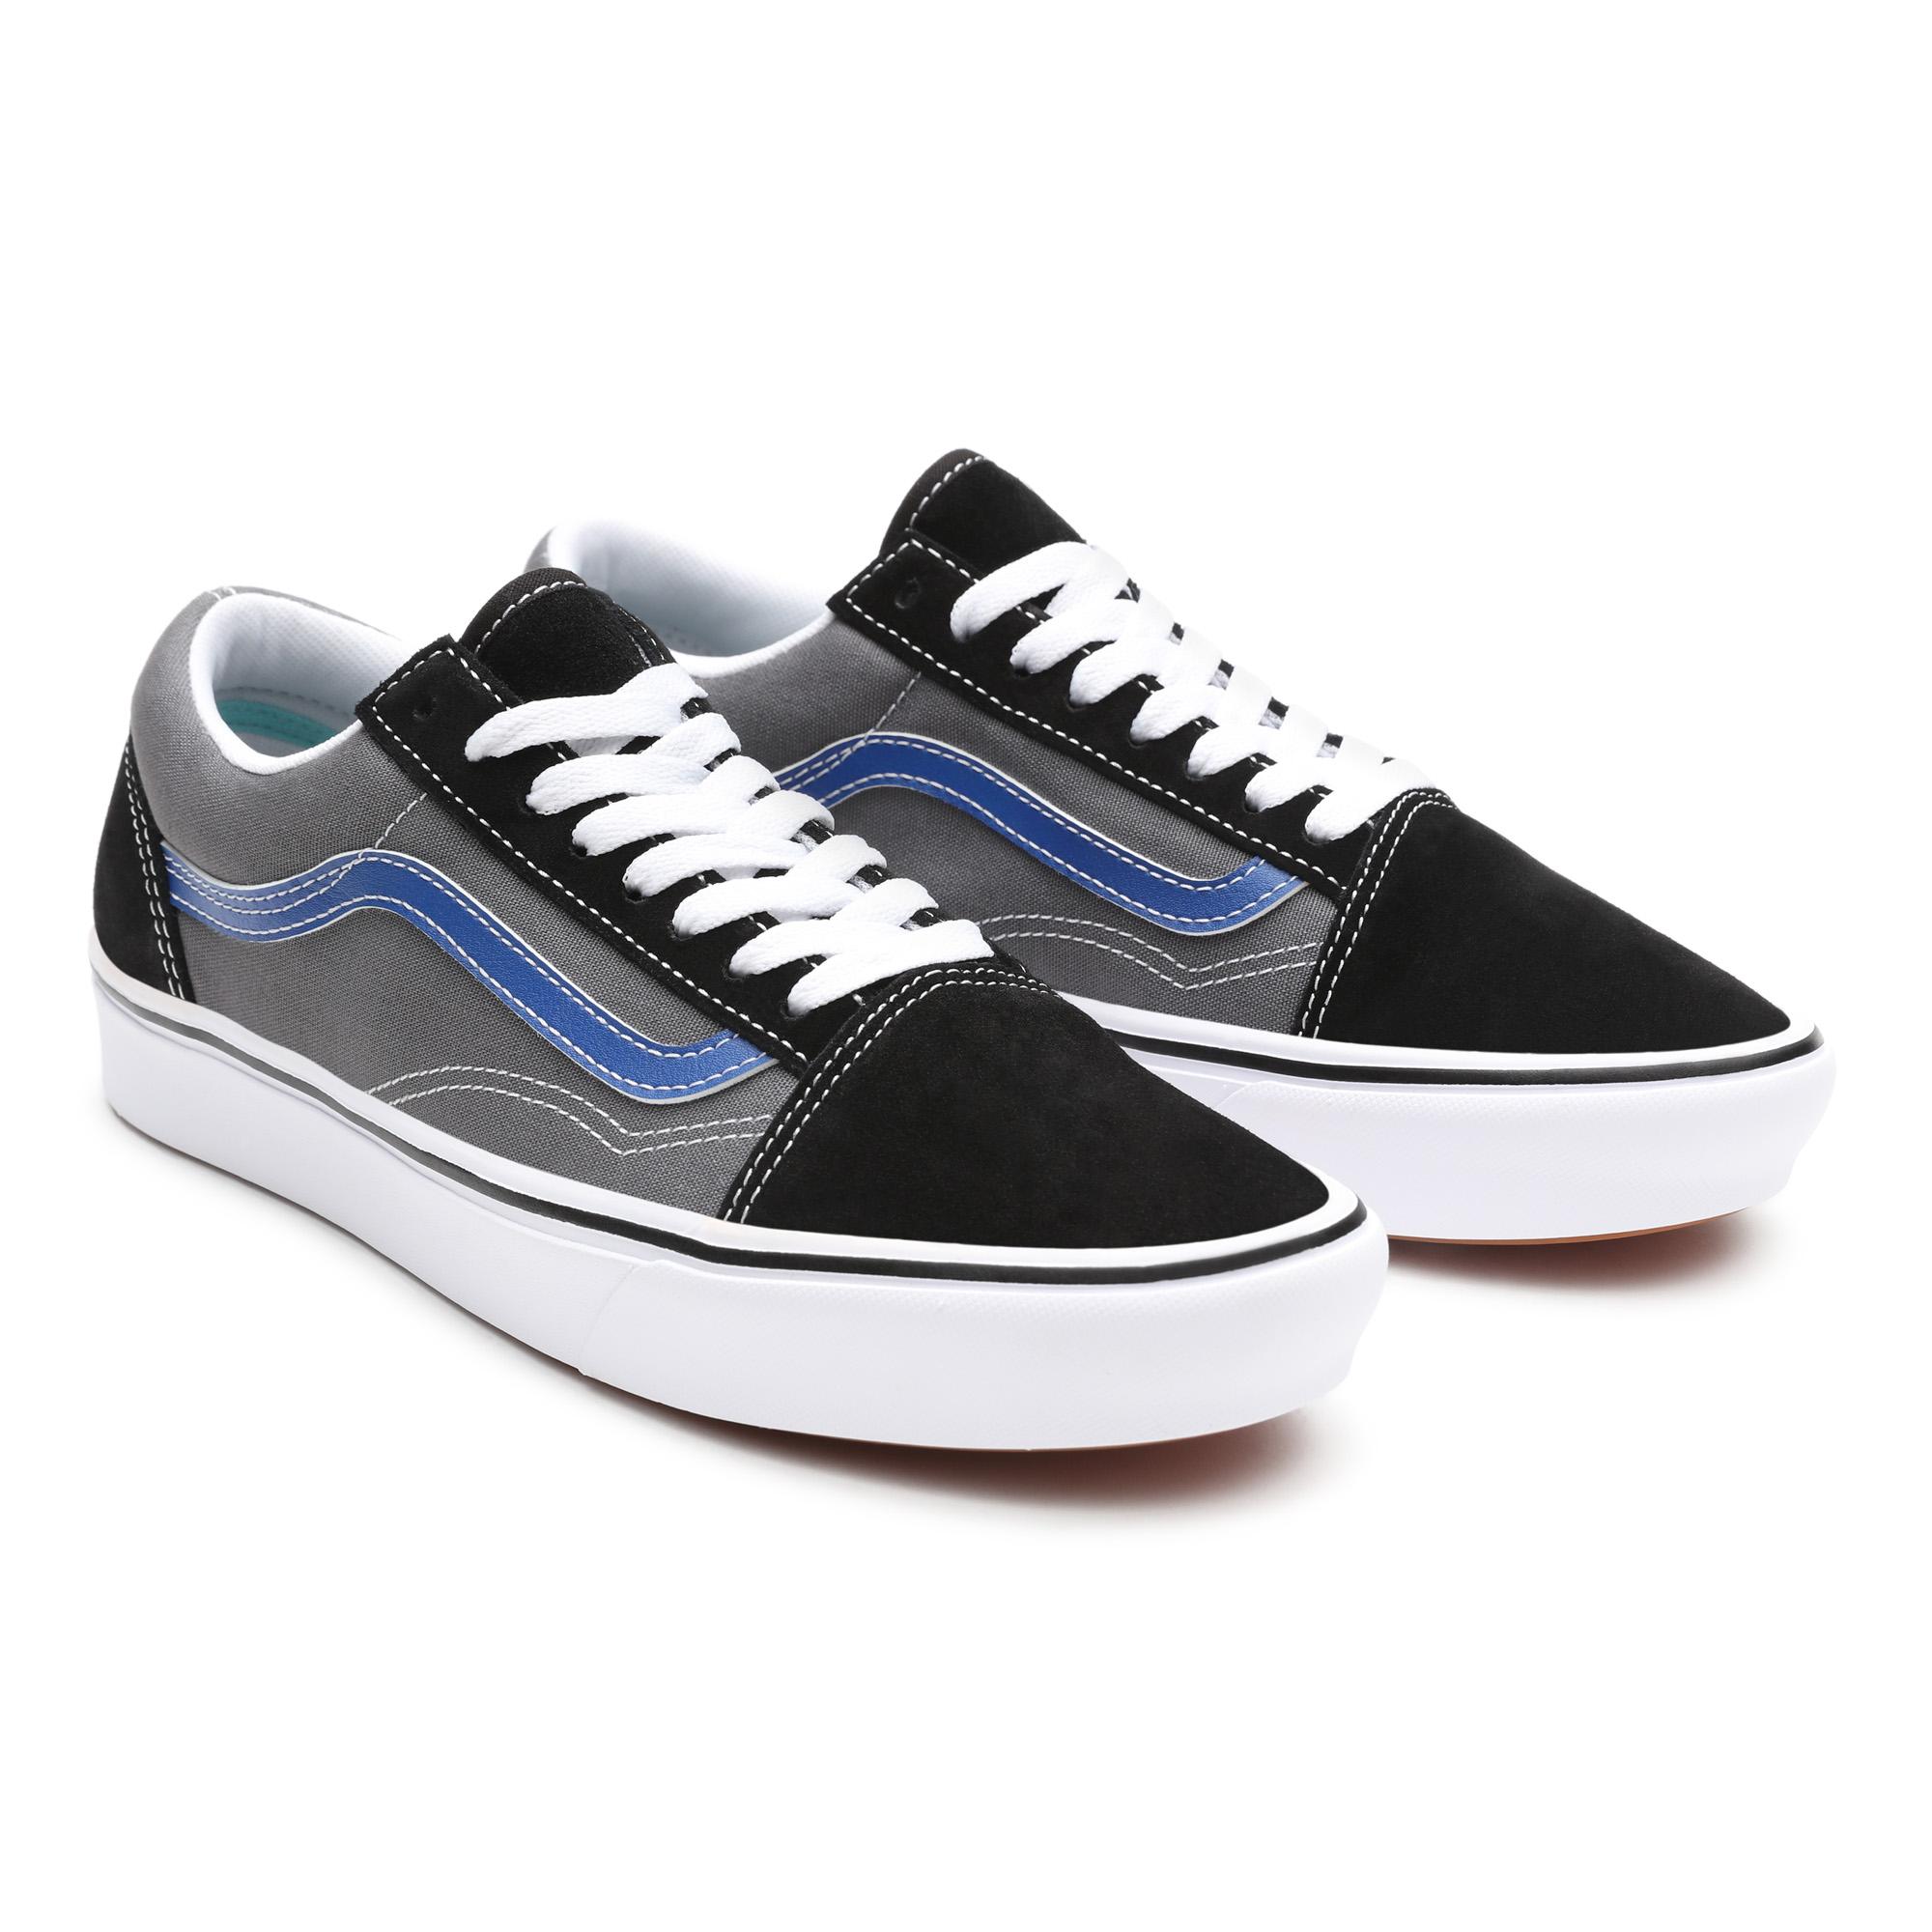 Vans Comfycush old sneaker, black pewter, 43